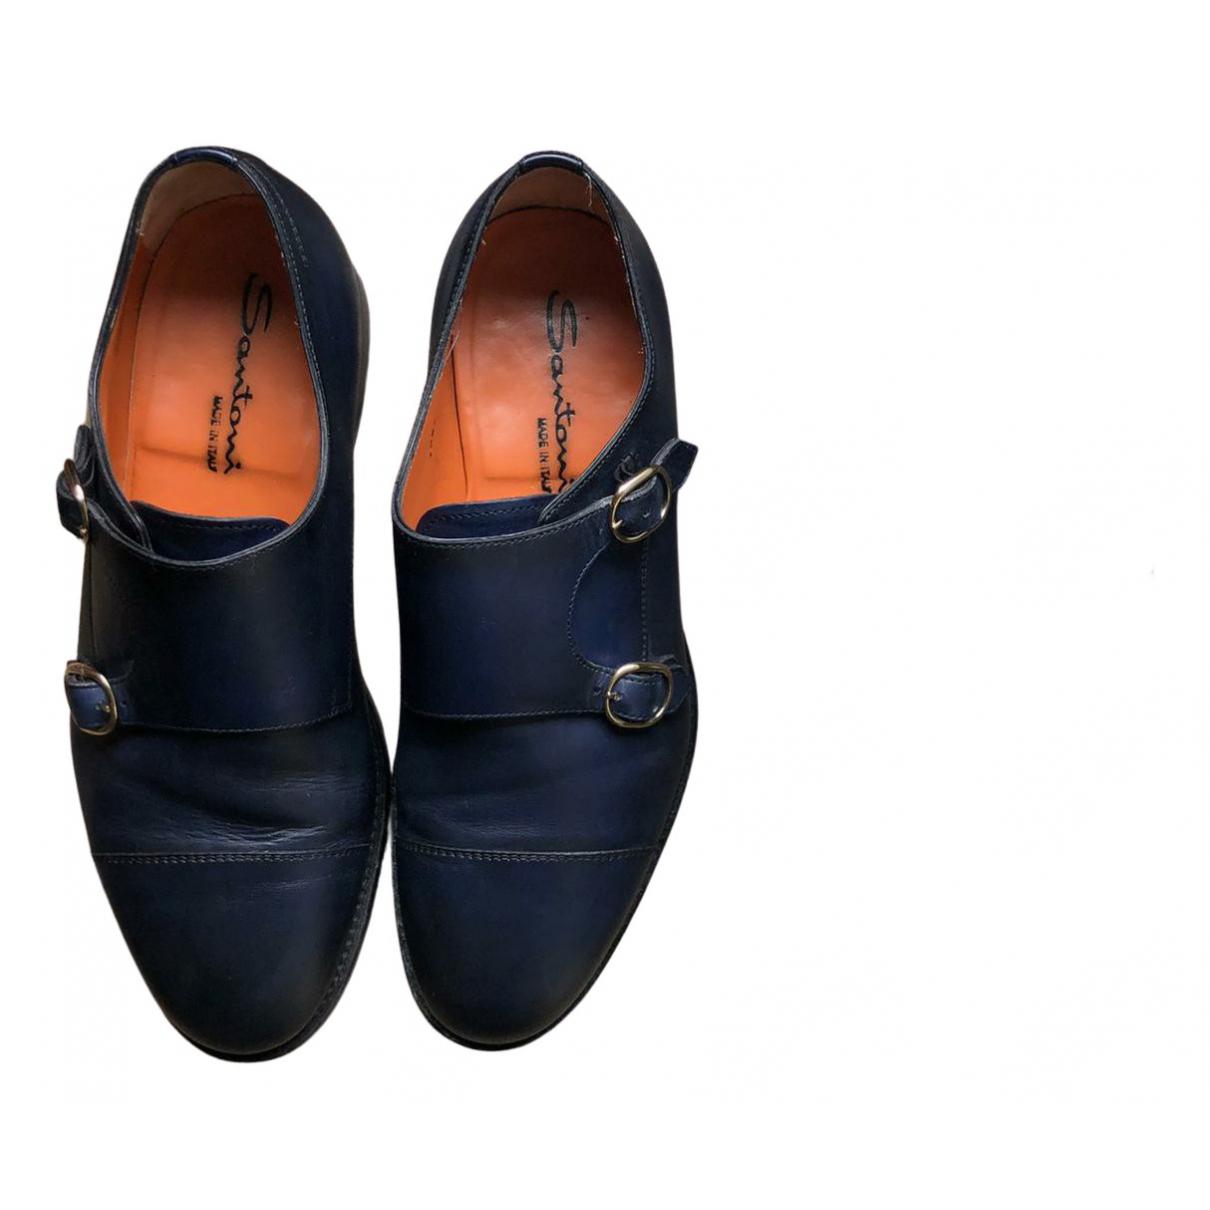 Santoni \N Schnuerschuhe in  Blau Leder